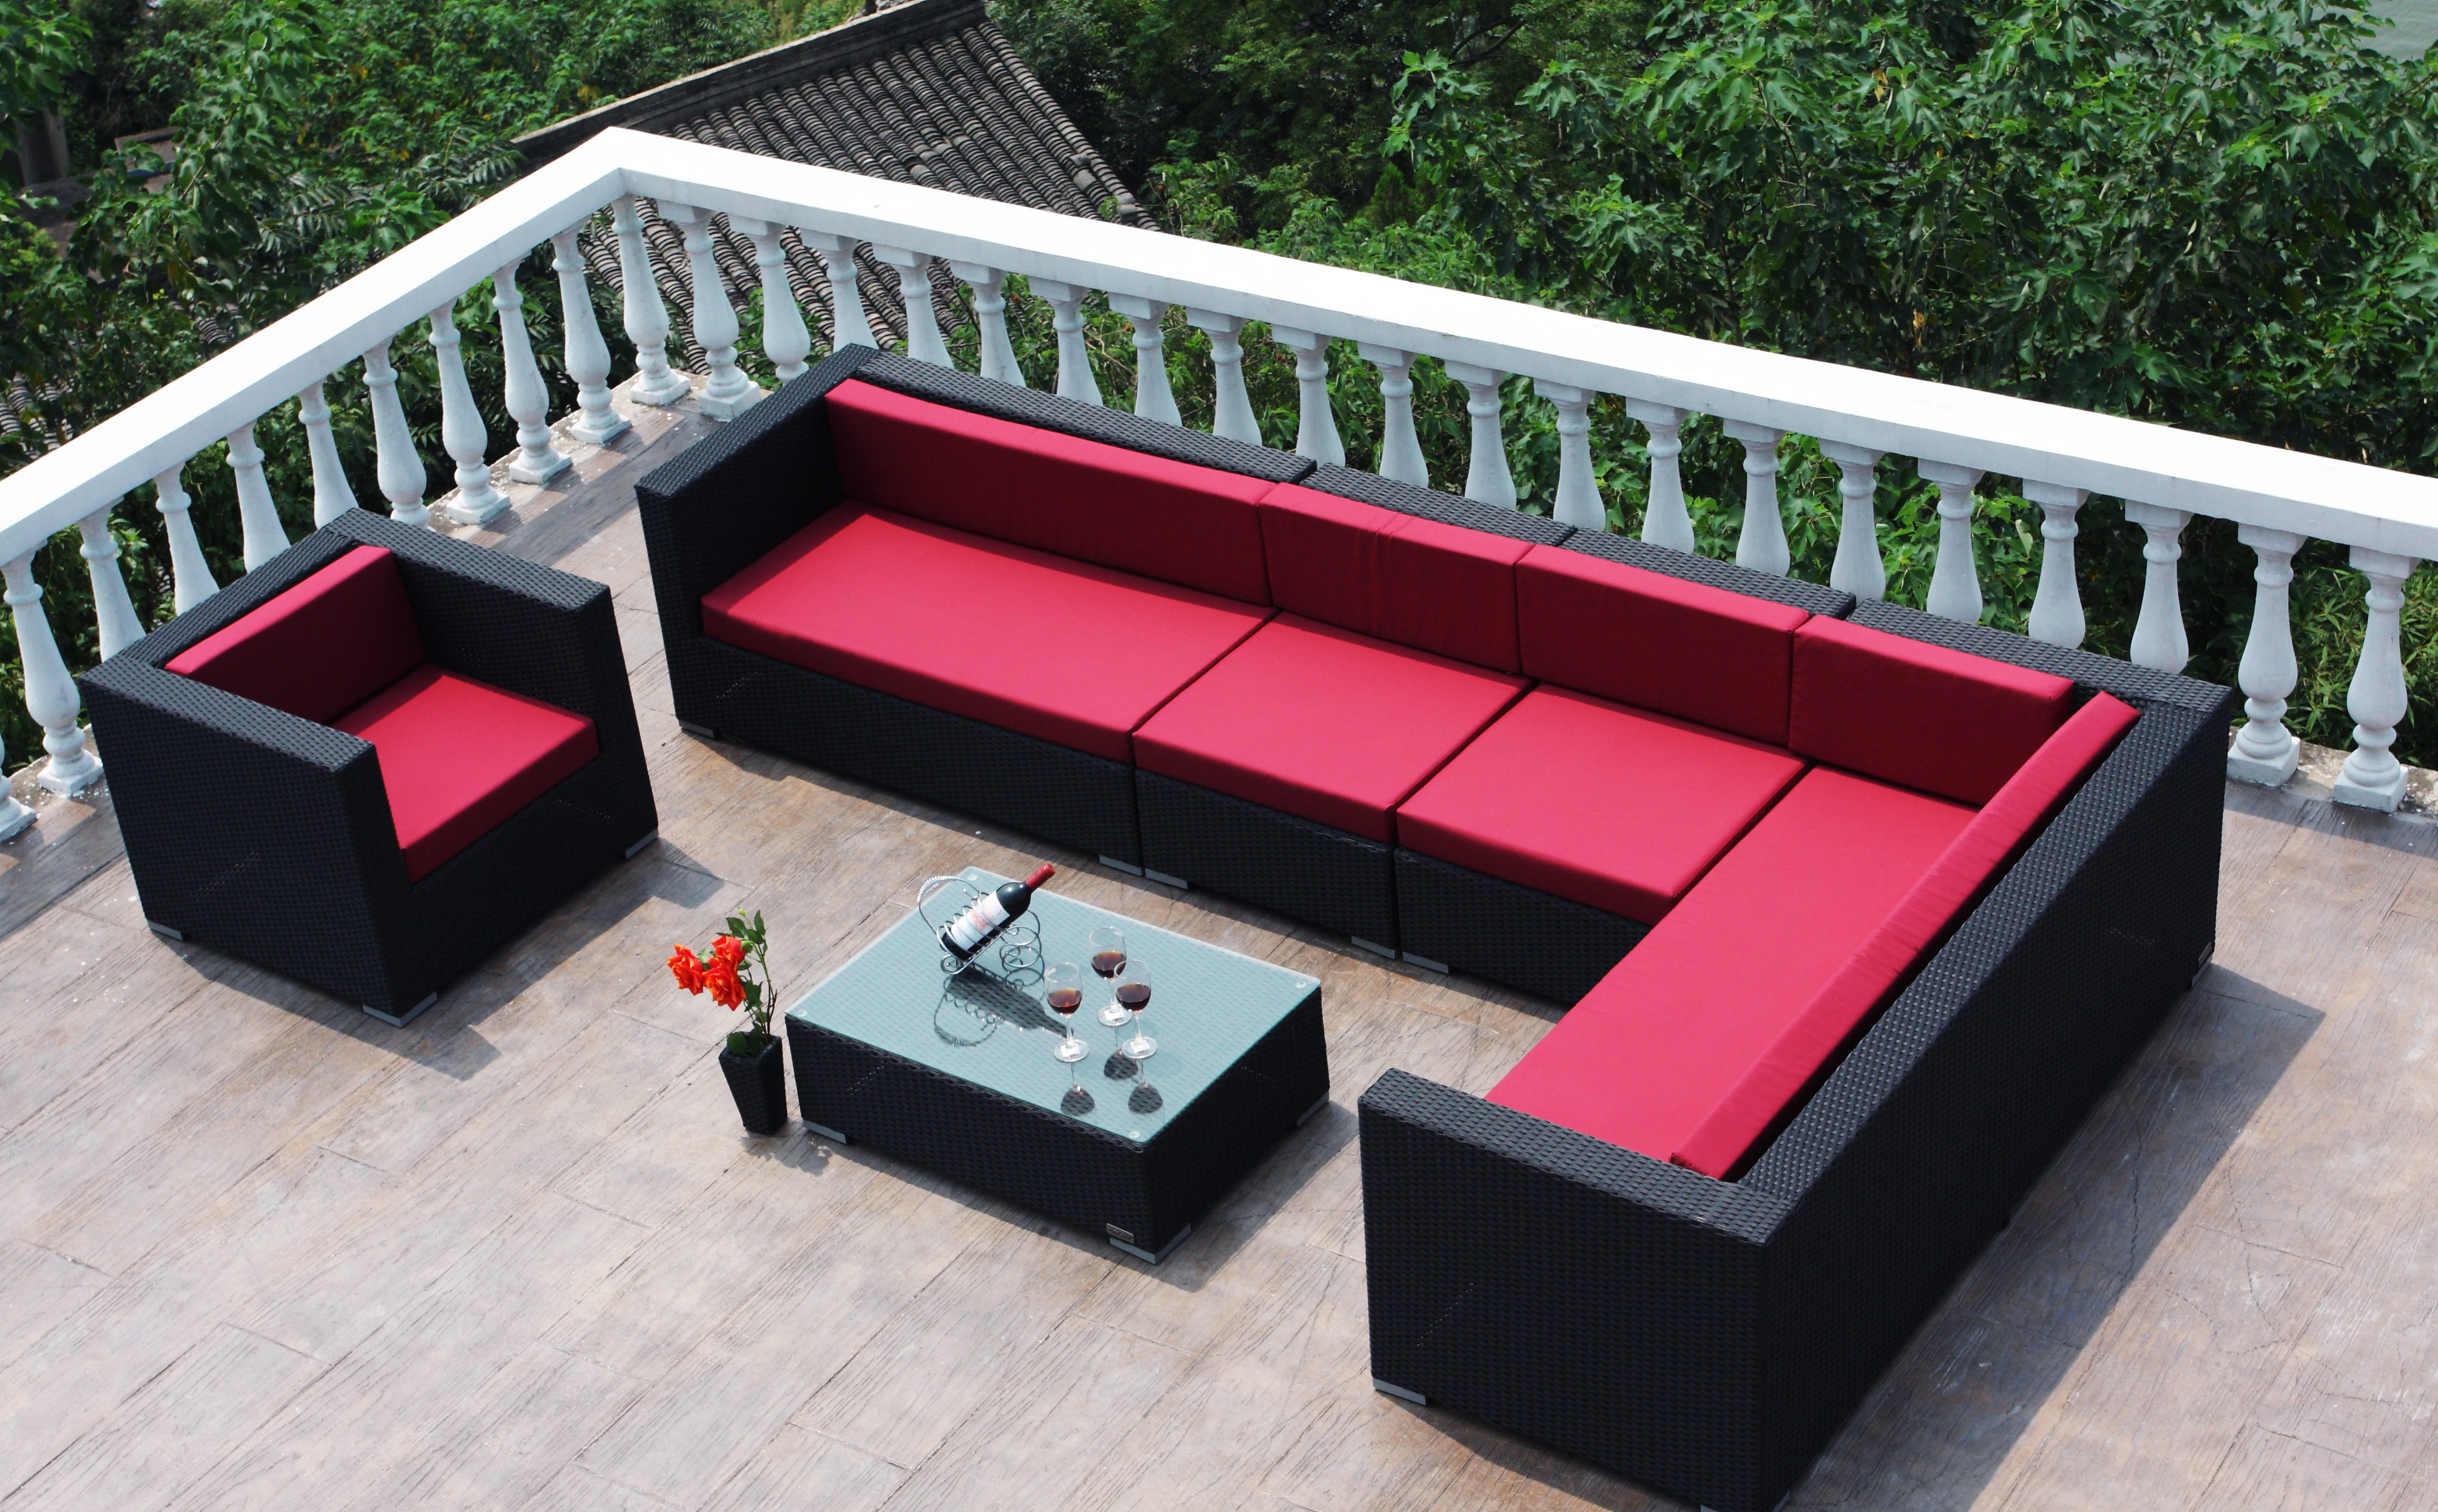 Polyrattan lounges gartenmoebel de for Gartenmobel polyrattan lounge